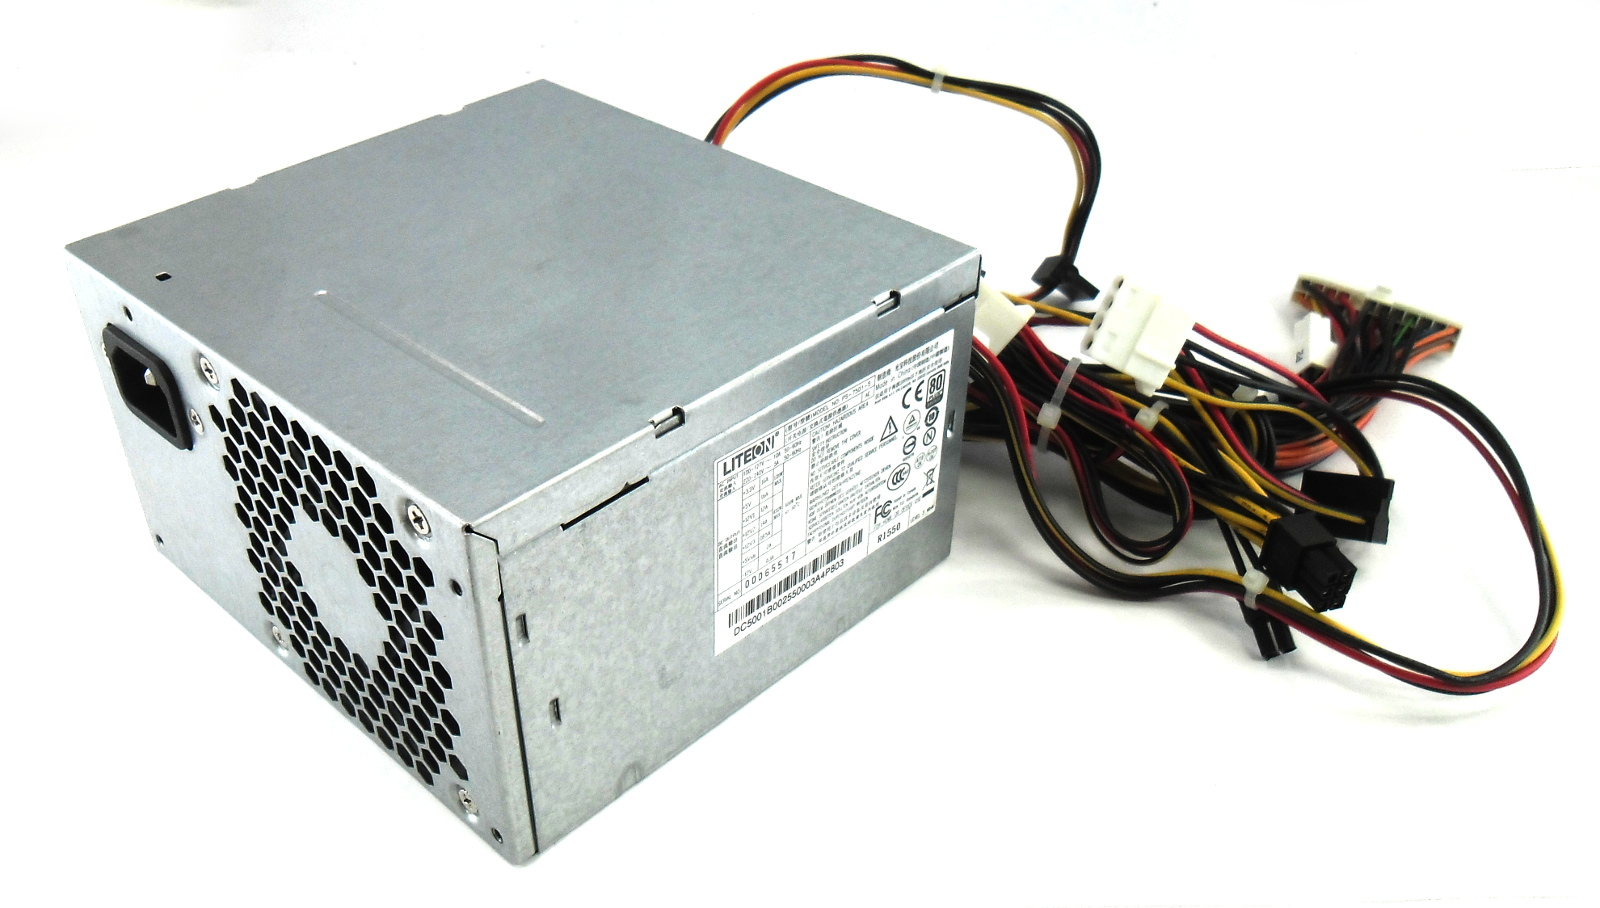 DC.5001B.004 LiteOn PS-7501-5AF 500W ATX Power Supply /f Predator PO3-600